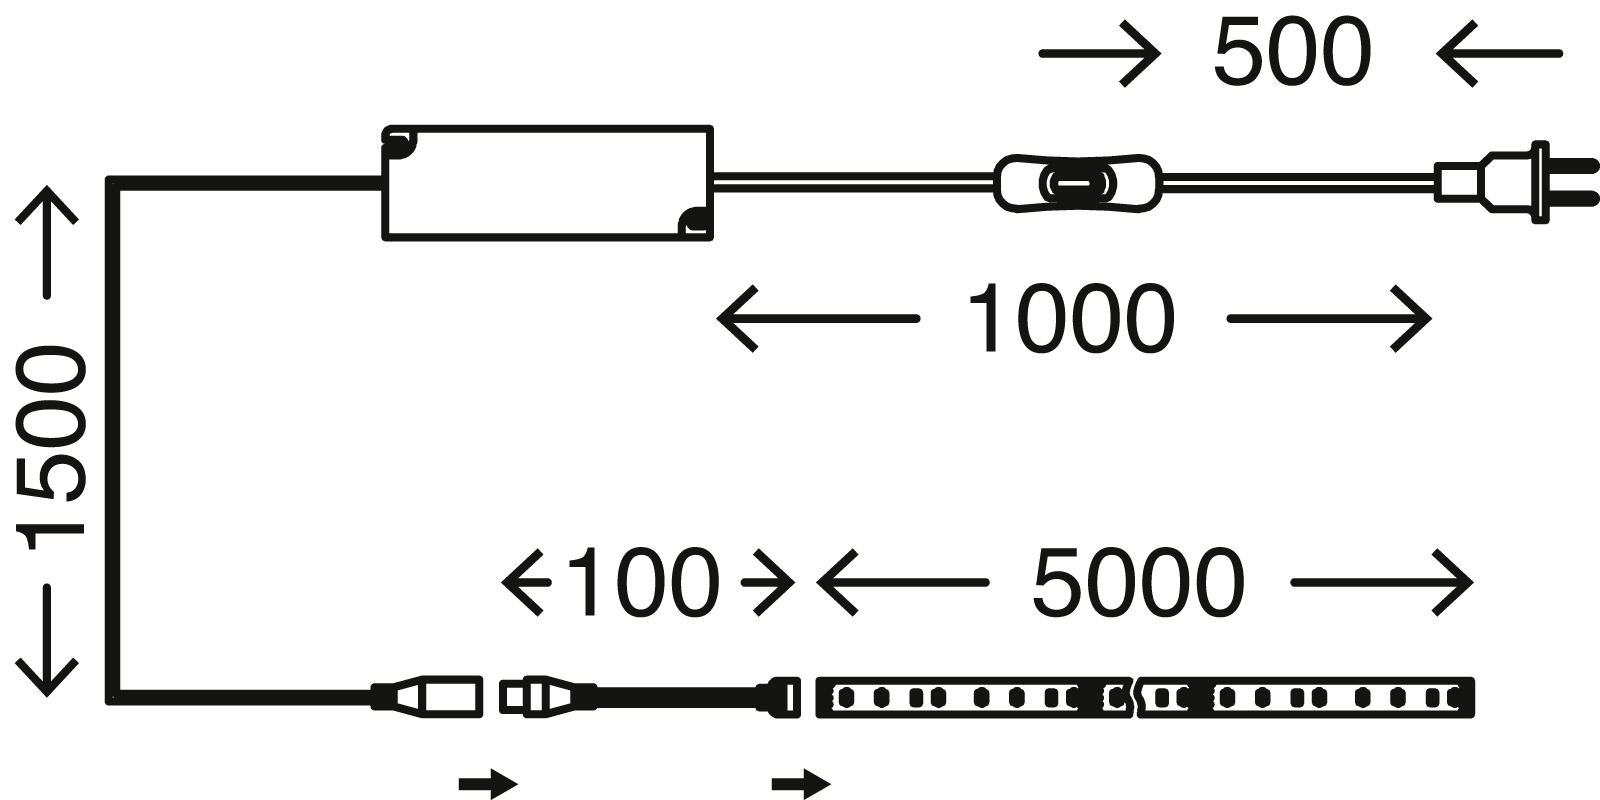 LED Flexband, 5 Meter, 60 W, Silber